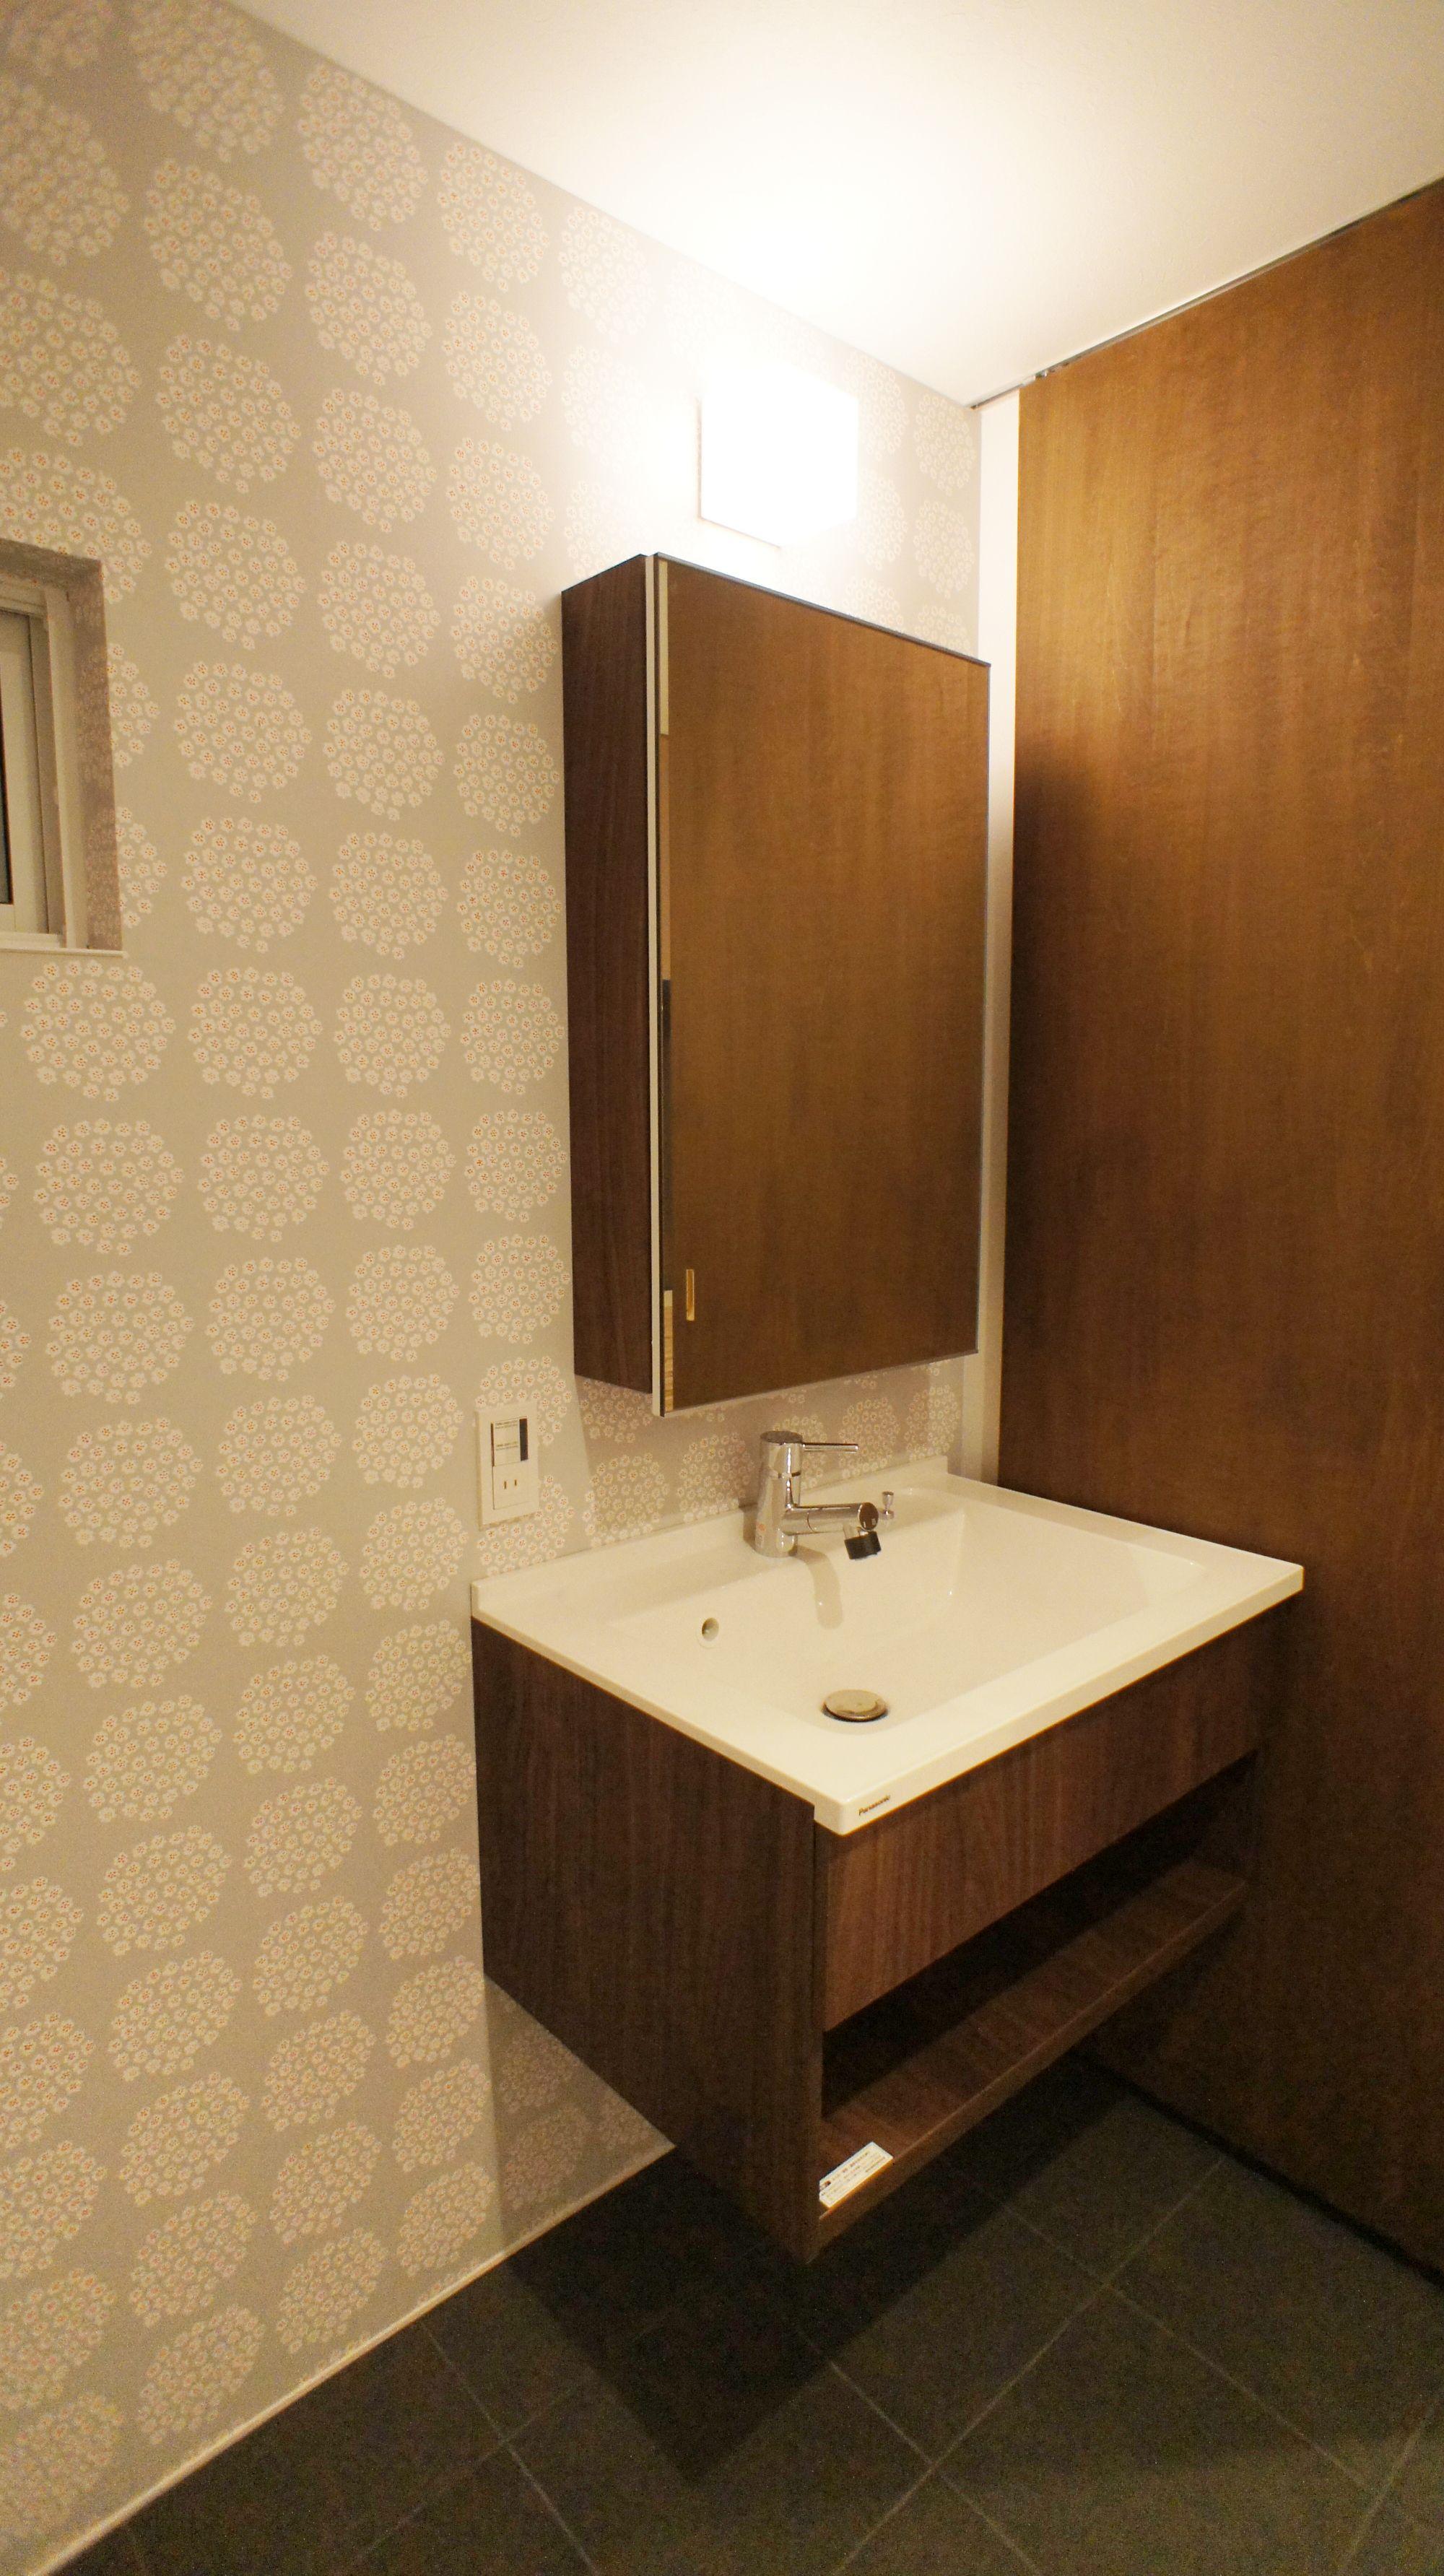 321house ミツイハウス の写真集 広島 注文住宅 工務店 新築 インテリア 洗面 白い家